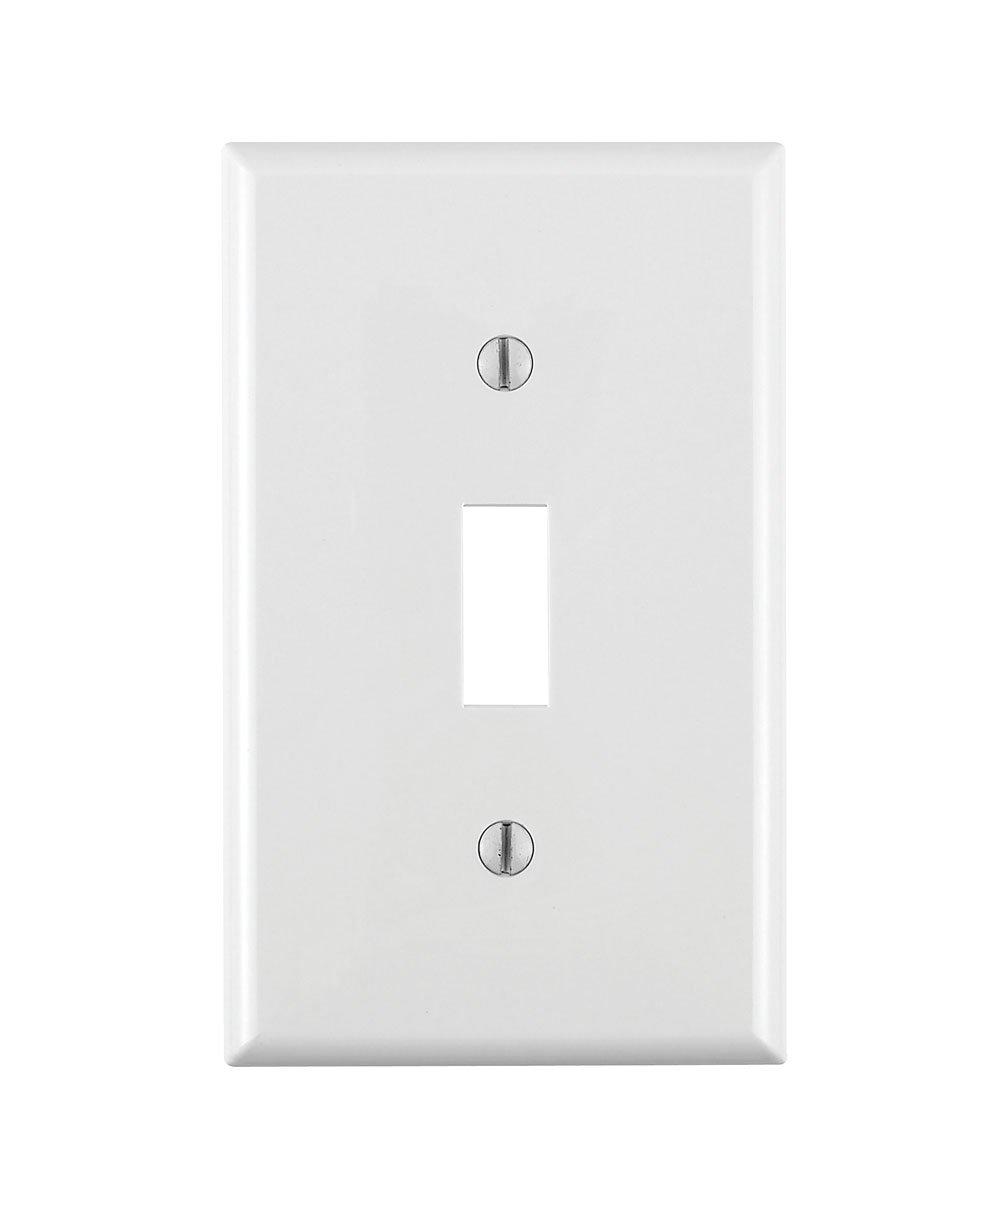 Leviton 80701-W 1-Gang Toggle Device Switch Wallplate, Standard Size ...